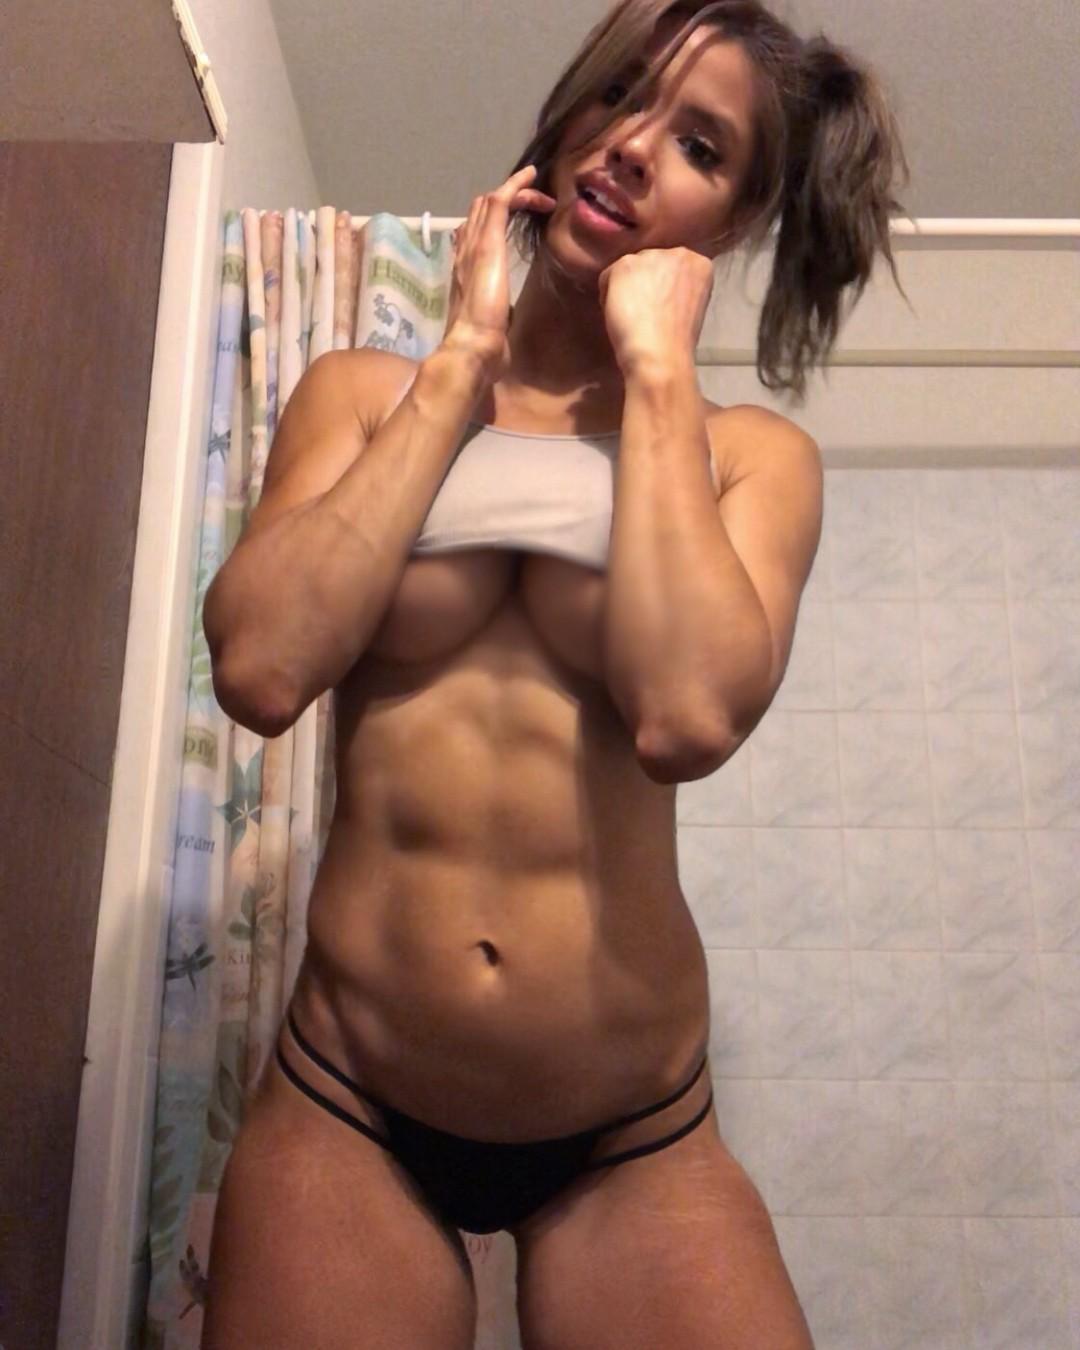 Kayli-Ann-Phillips-Nude-Sexy-The-Fappening-Pro-24.jpg